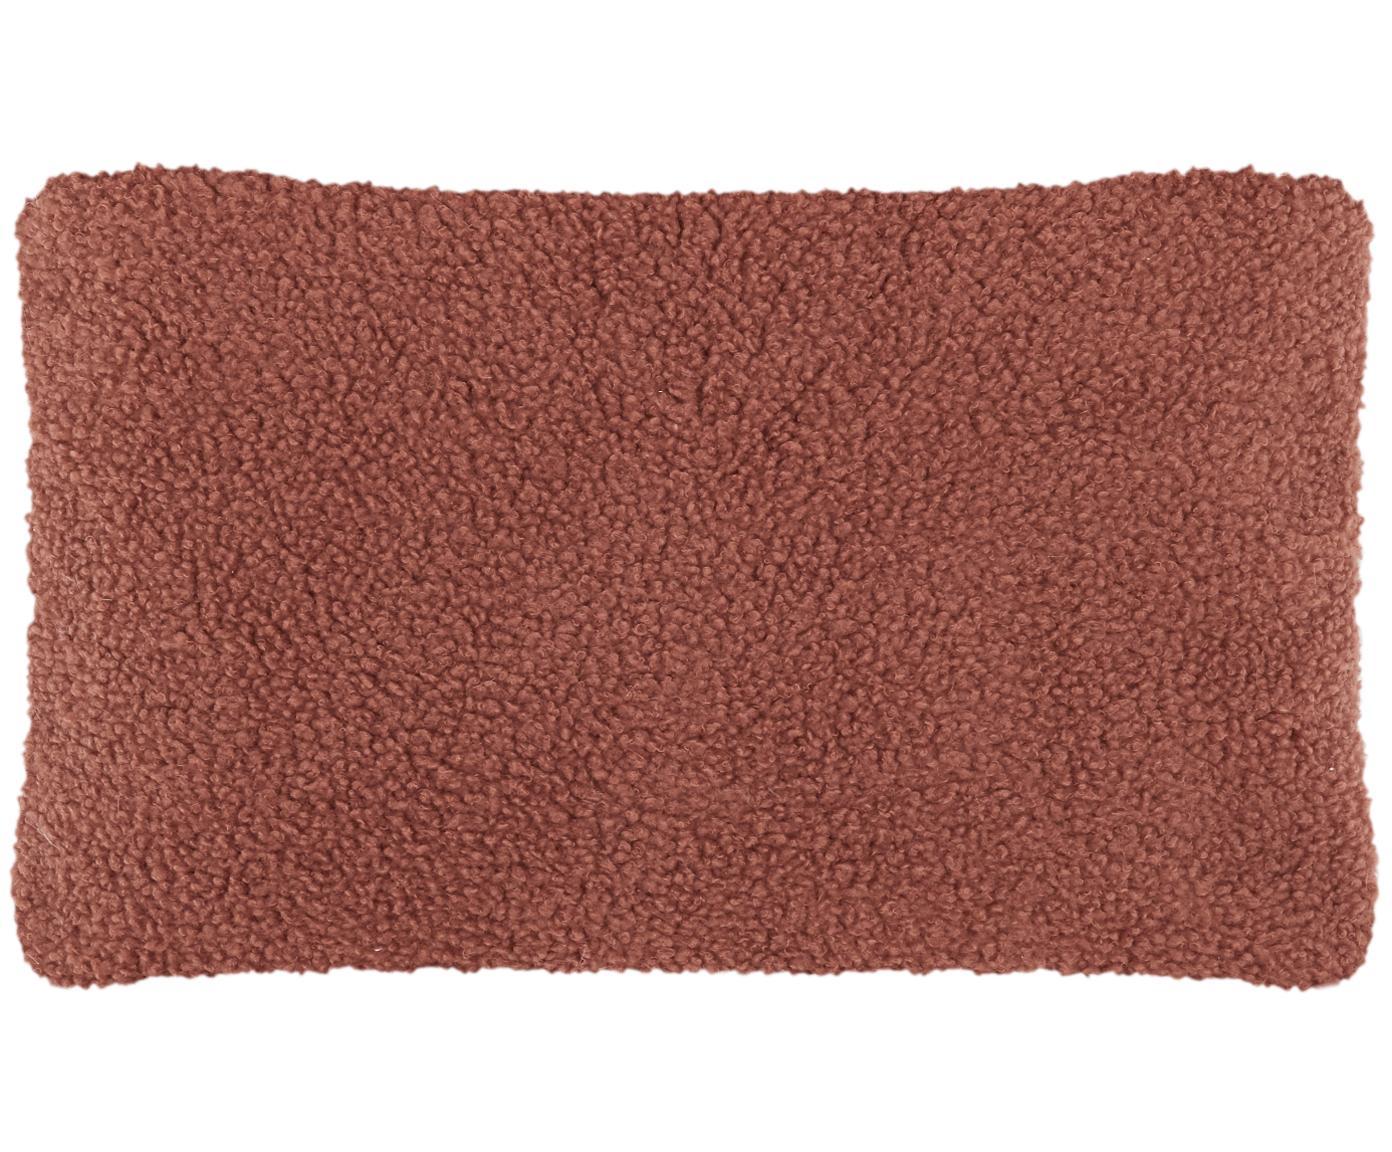 Funda de cojín de borreguillo Mille, Parte delantera: 100%poliéster (borreguil, Parte trasera: 100%poliéster (borreguil, Terracota, An 30 x L 50 cm